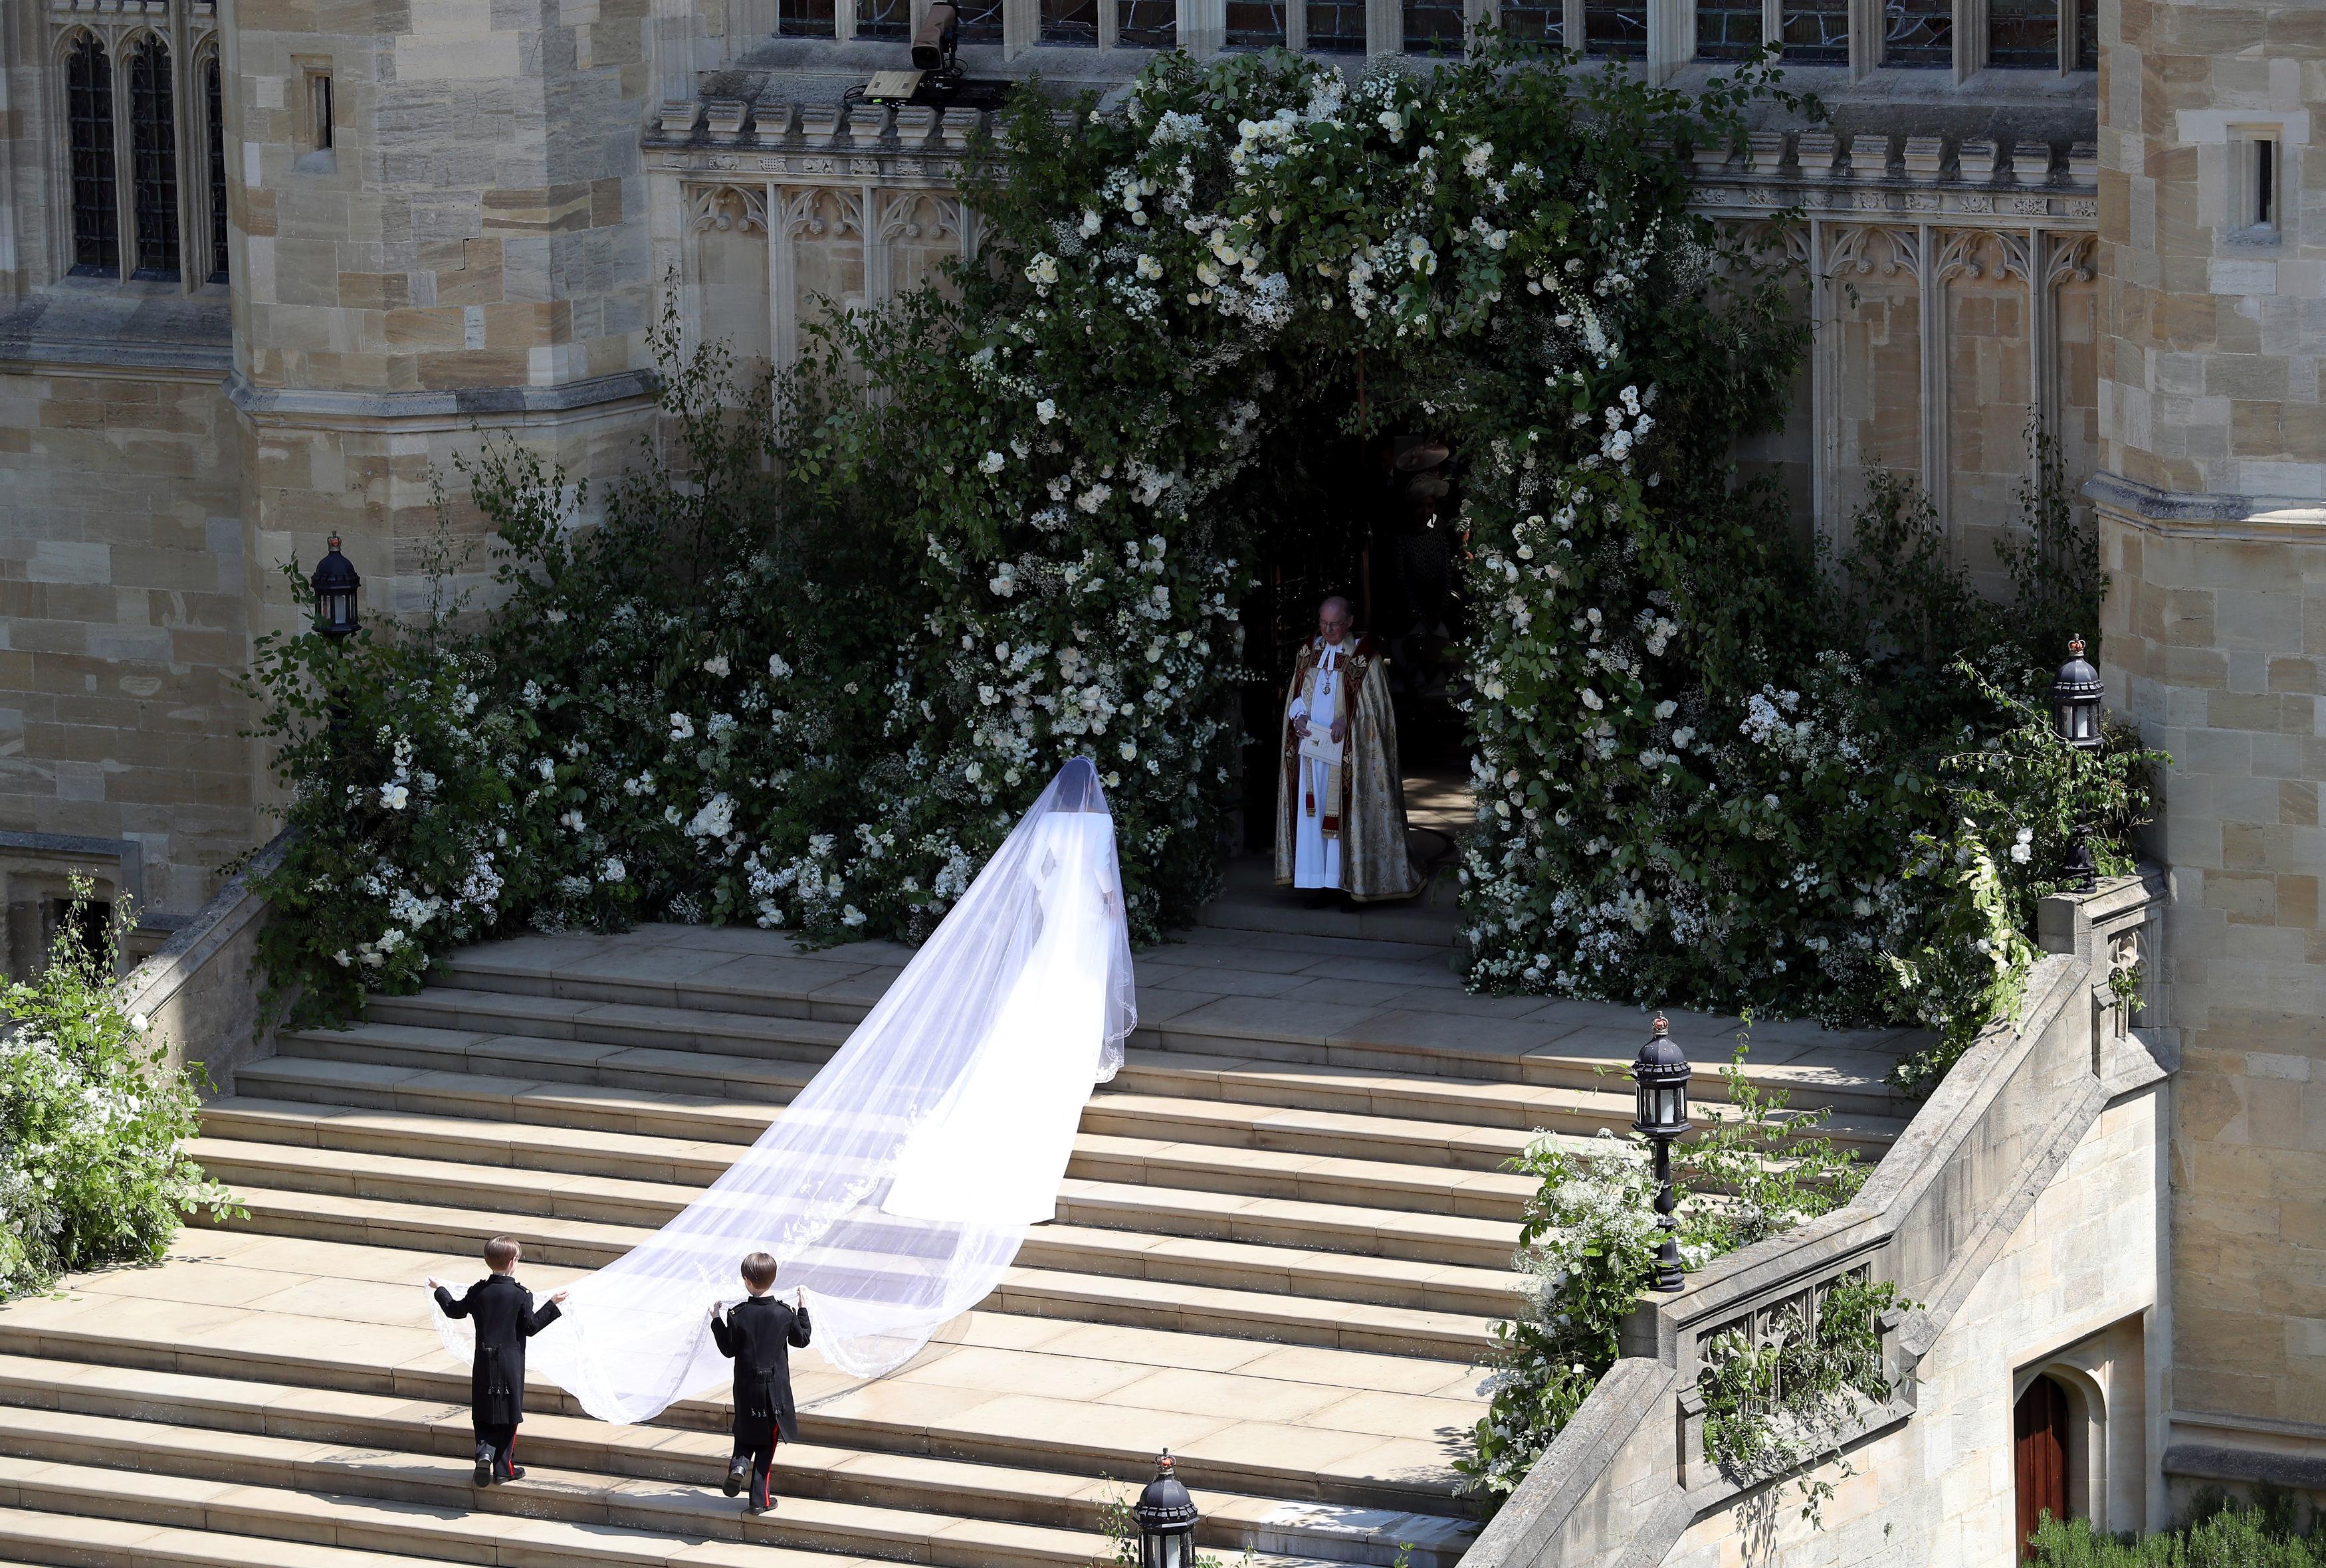 see meghan markle arrive at wedding chapel cnn video https www cnn com videos cnnmoney 2018 05 19 meghan markle first glimpse arrival royal wedding cnn